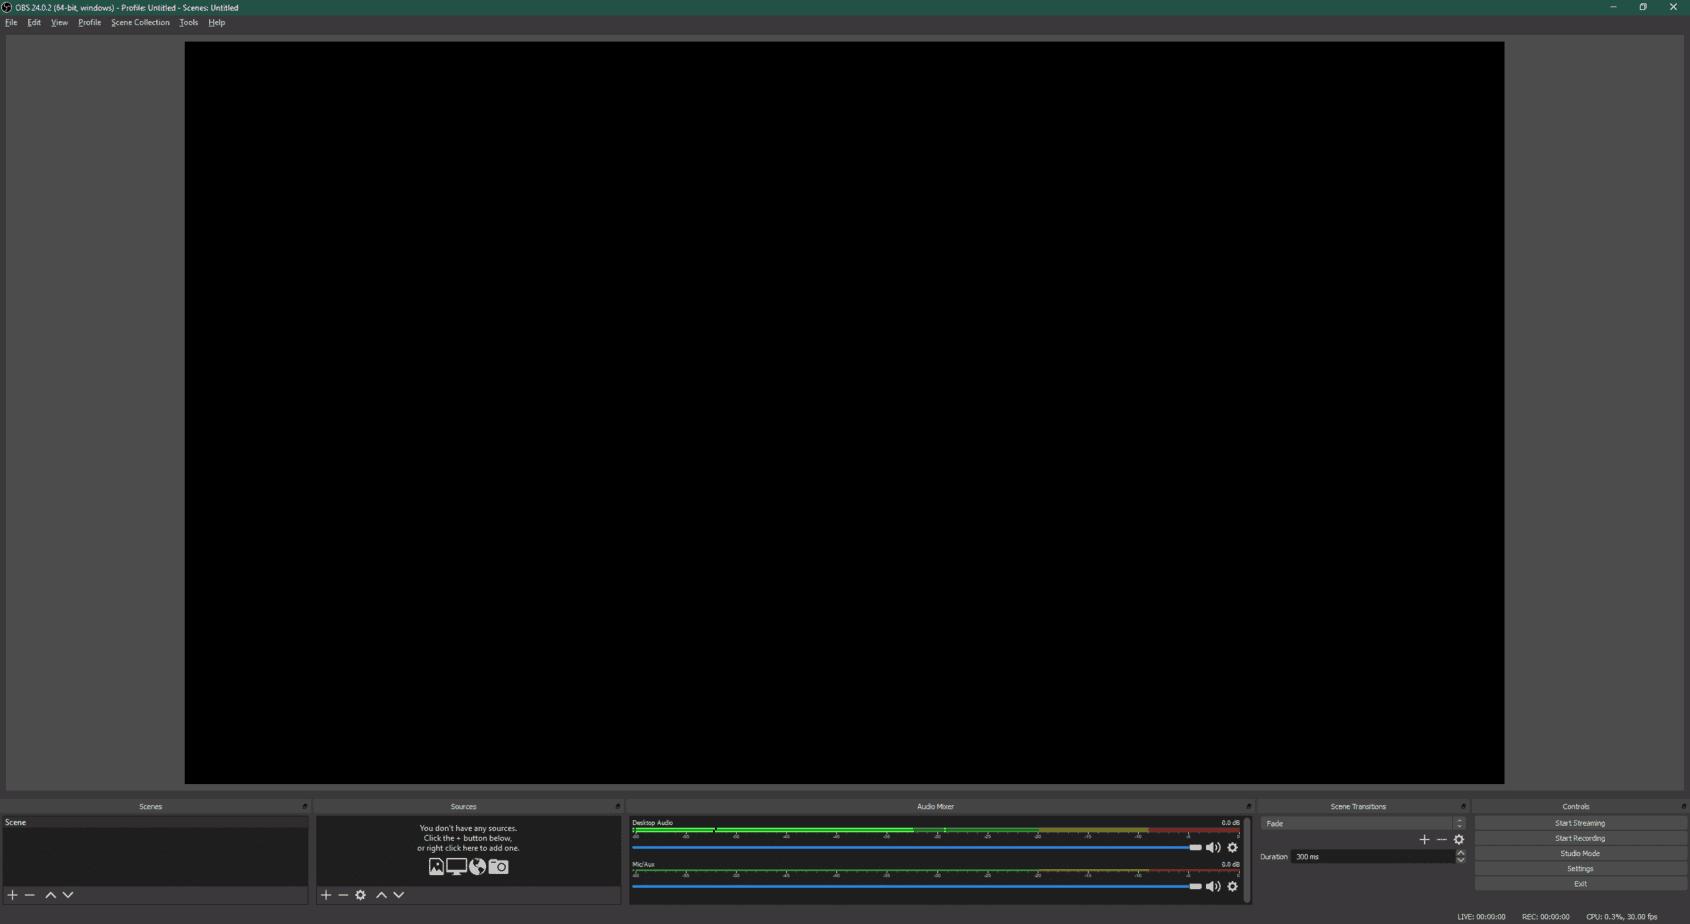 obs studio main screen